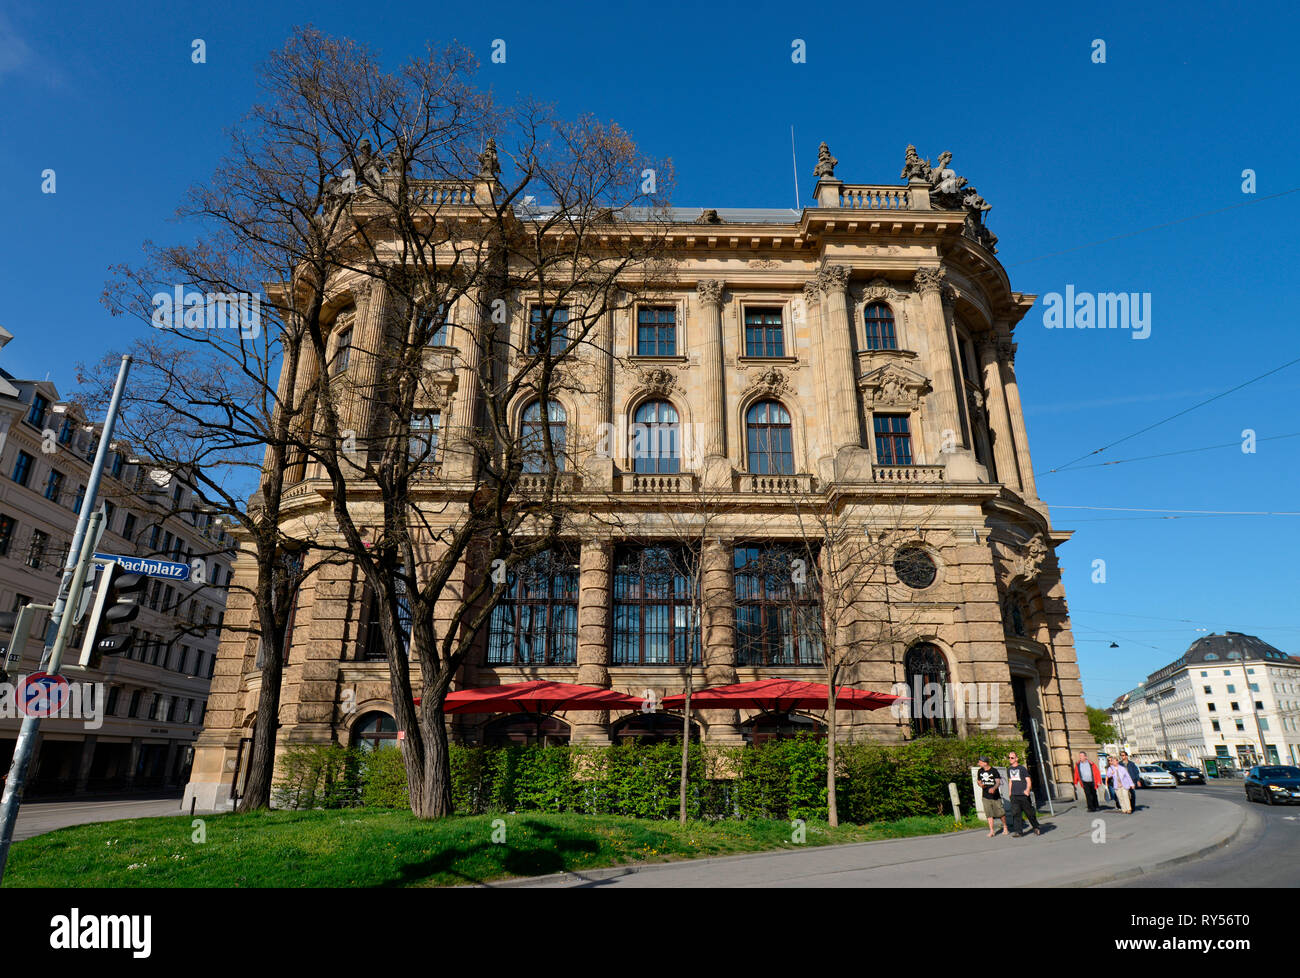 Alte Boerse, Lenbachplatz, Muenchen, Bayern, Deutschland, Alte Börse - Stock Image